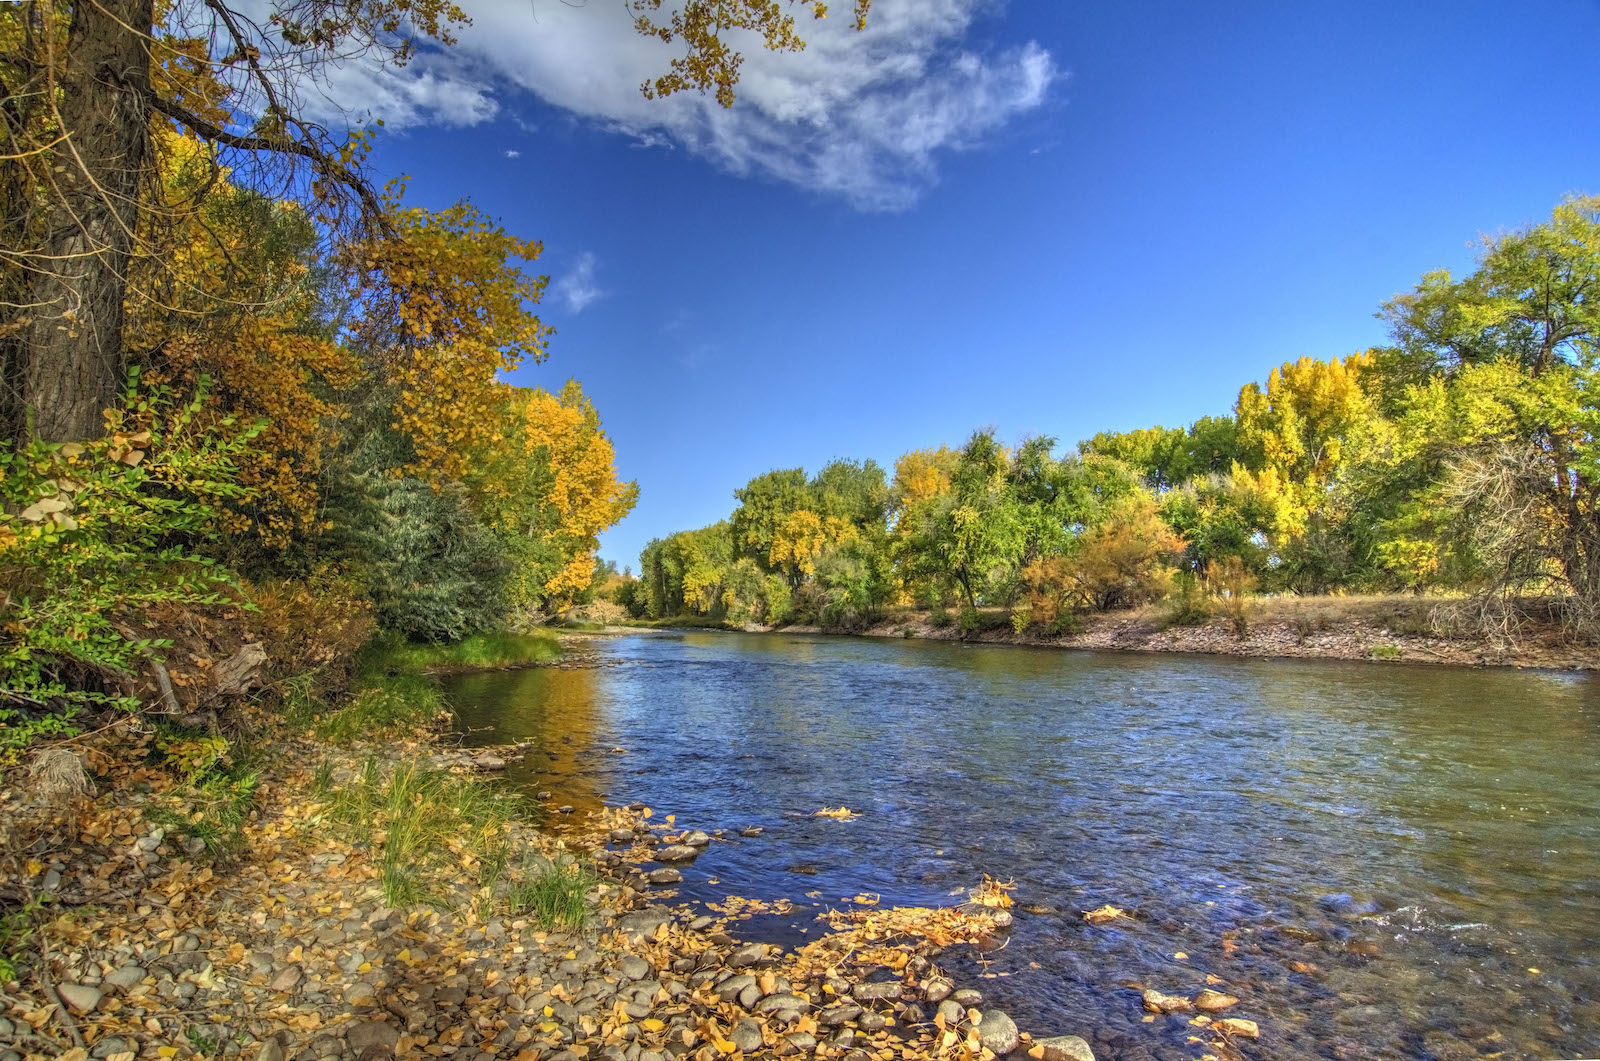 Arkansas River in Cañon City, Colorado